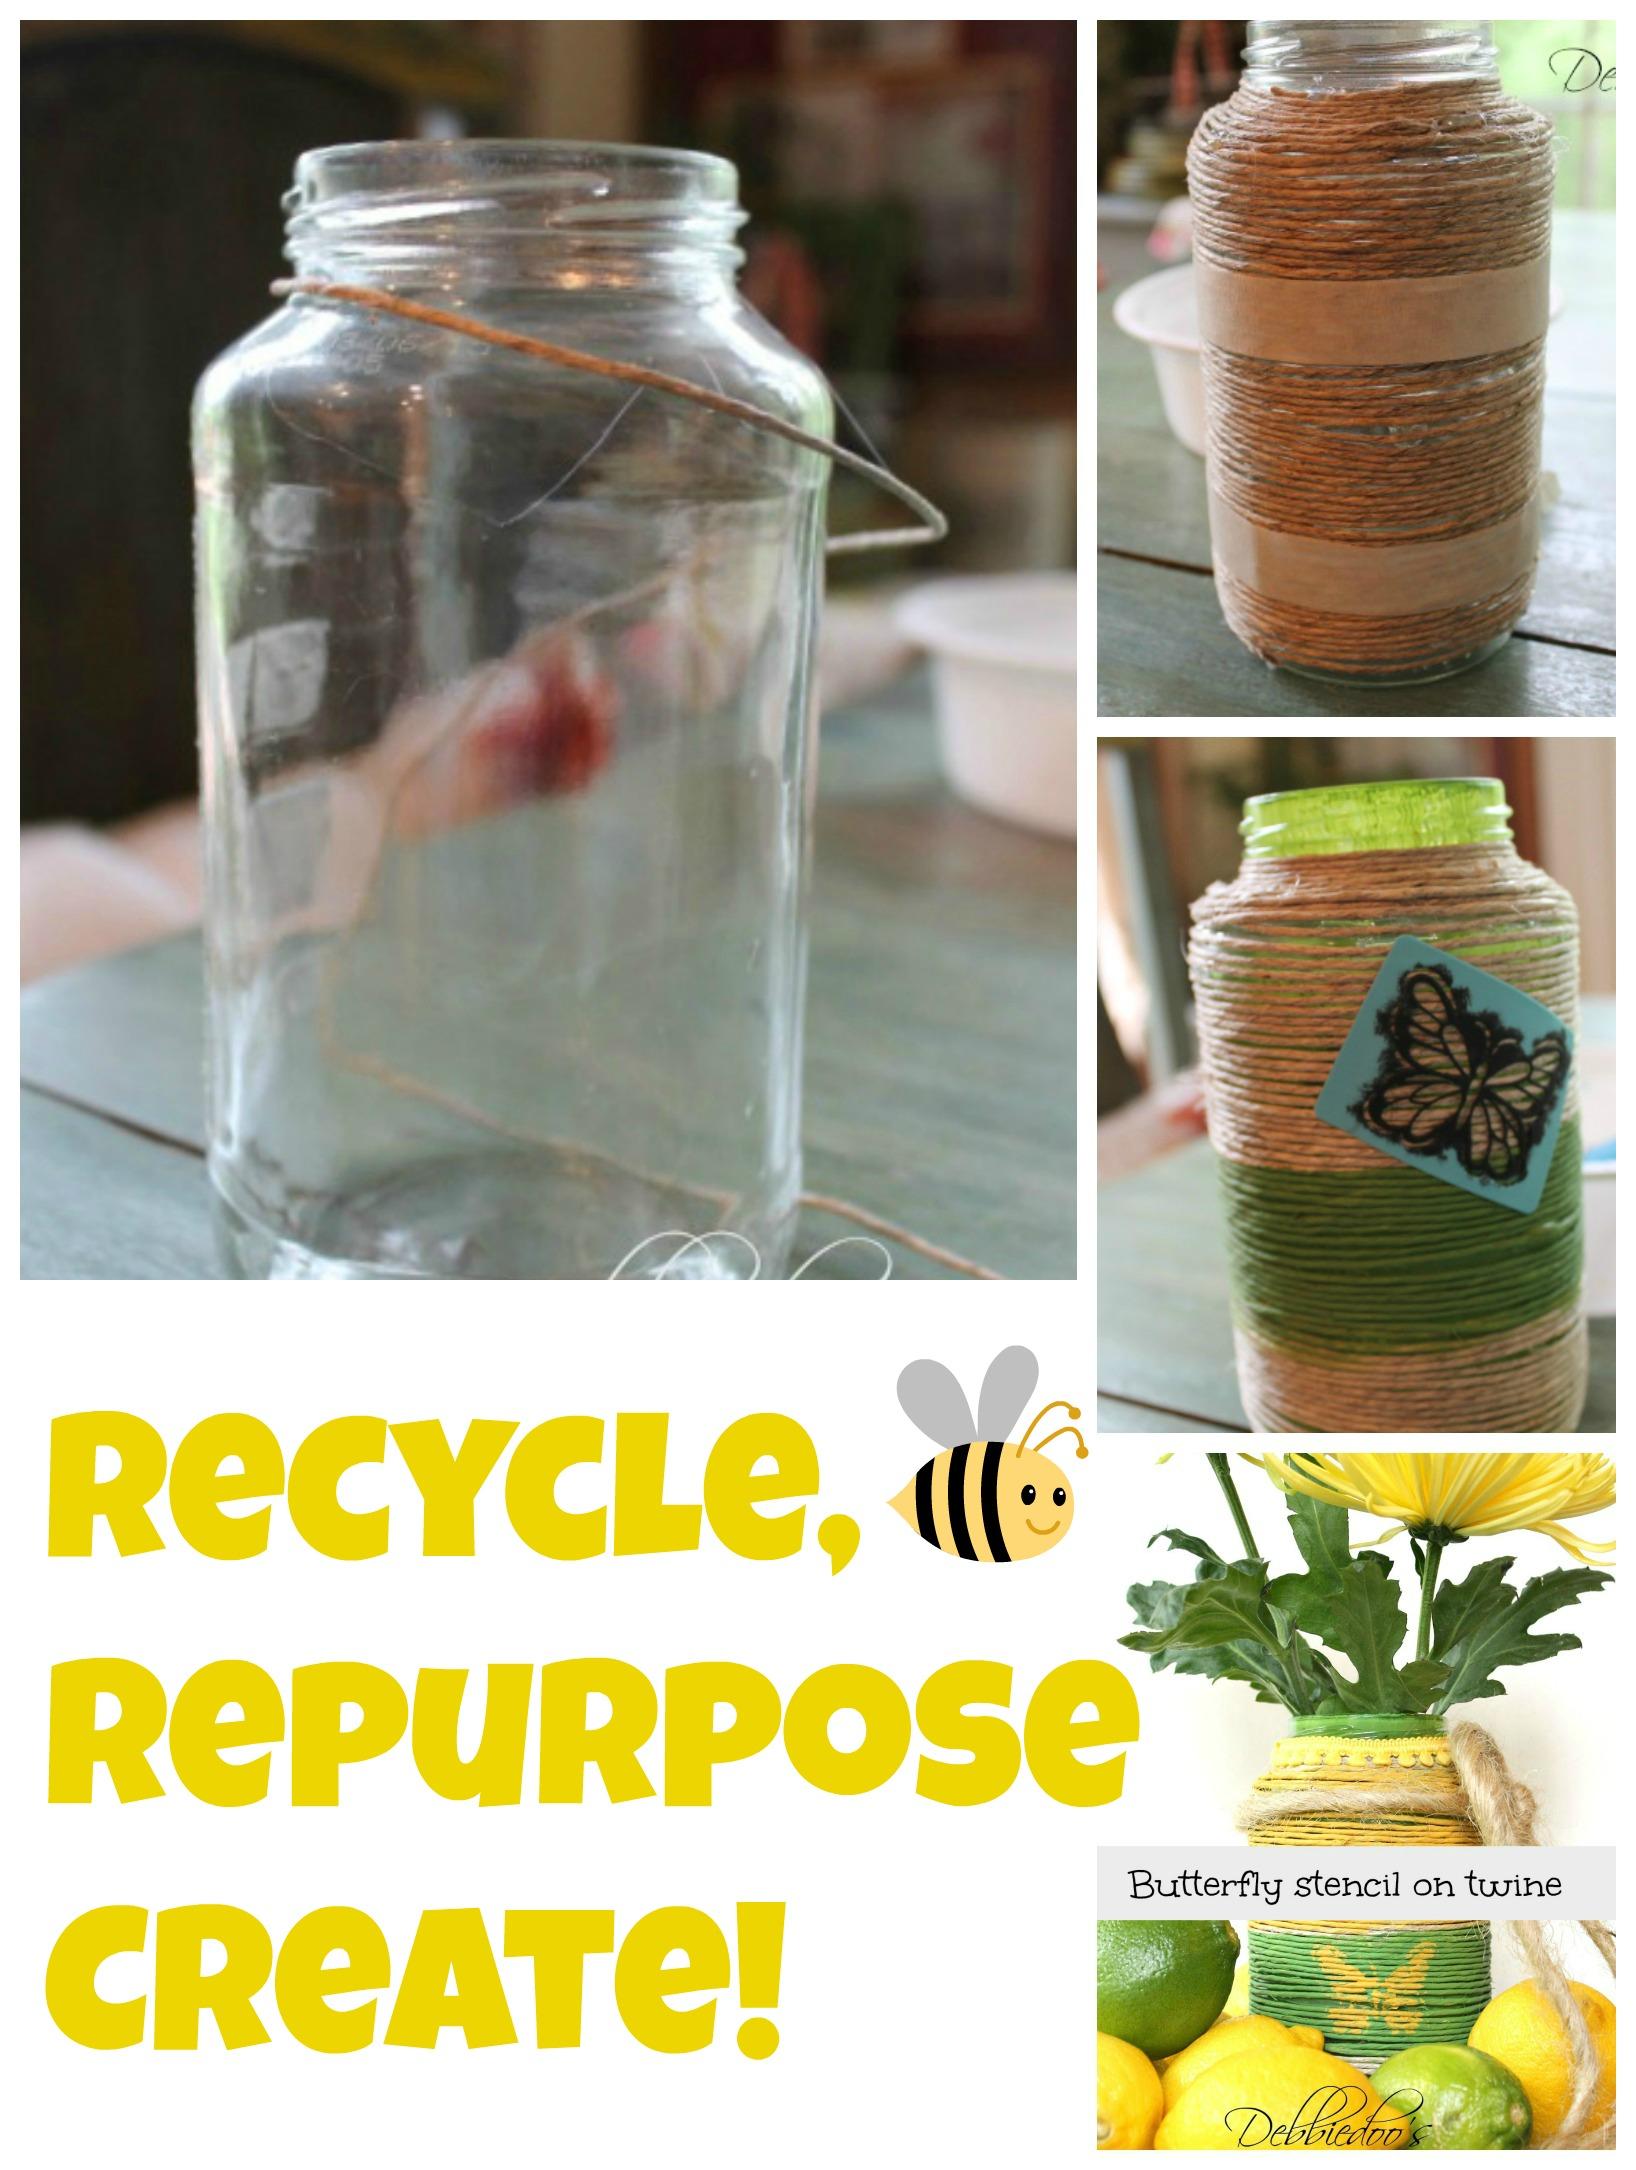 #recycle,#repurpose, create